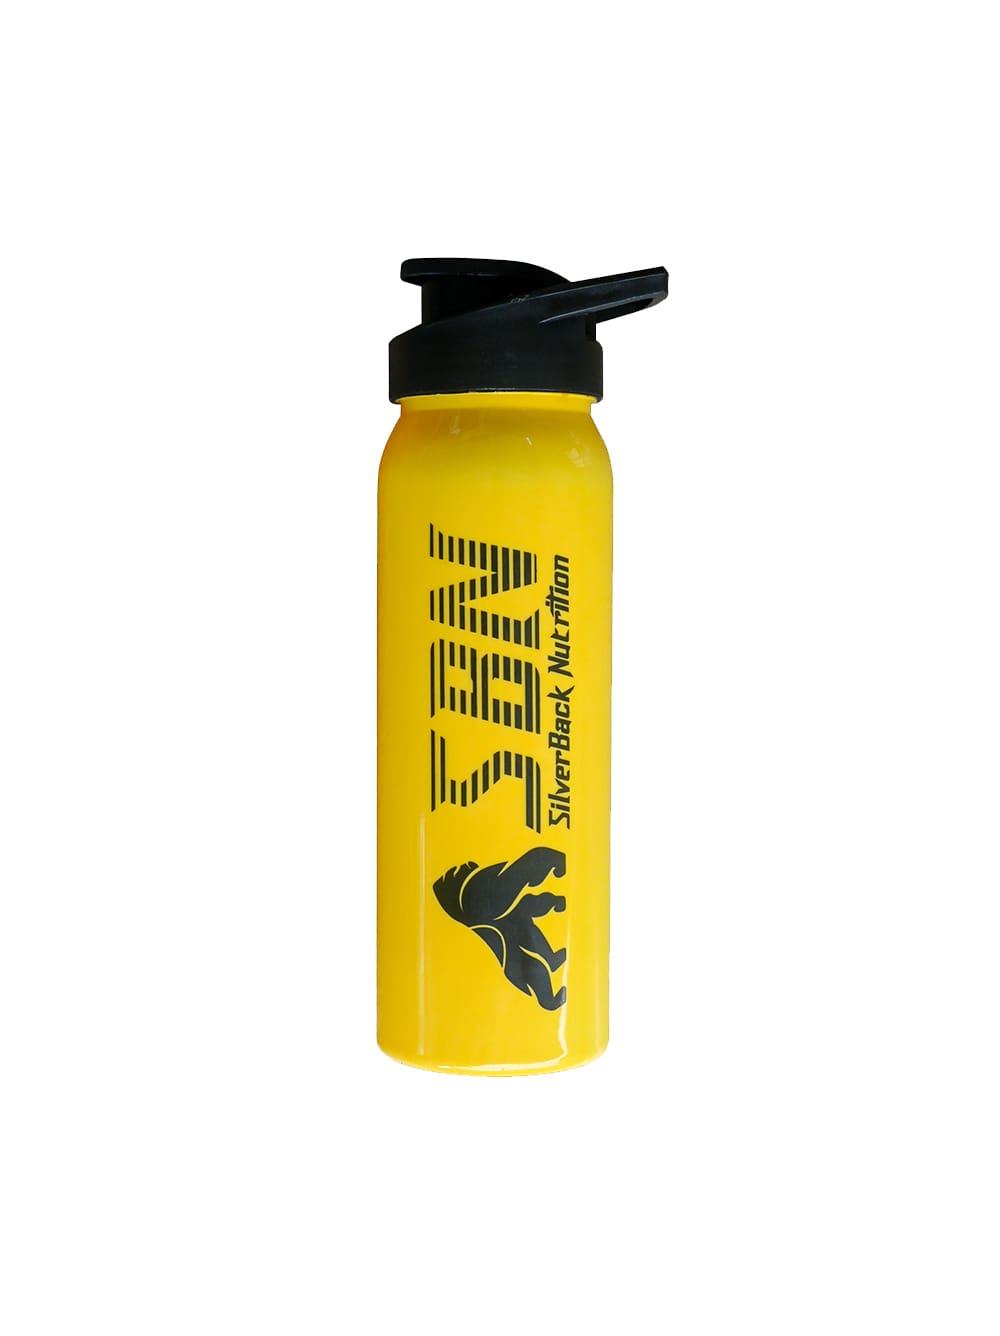 Shaker (Yellow) Final